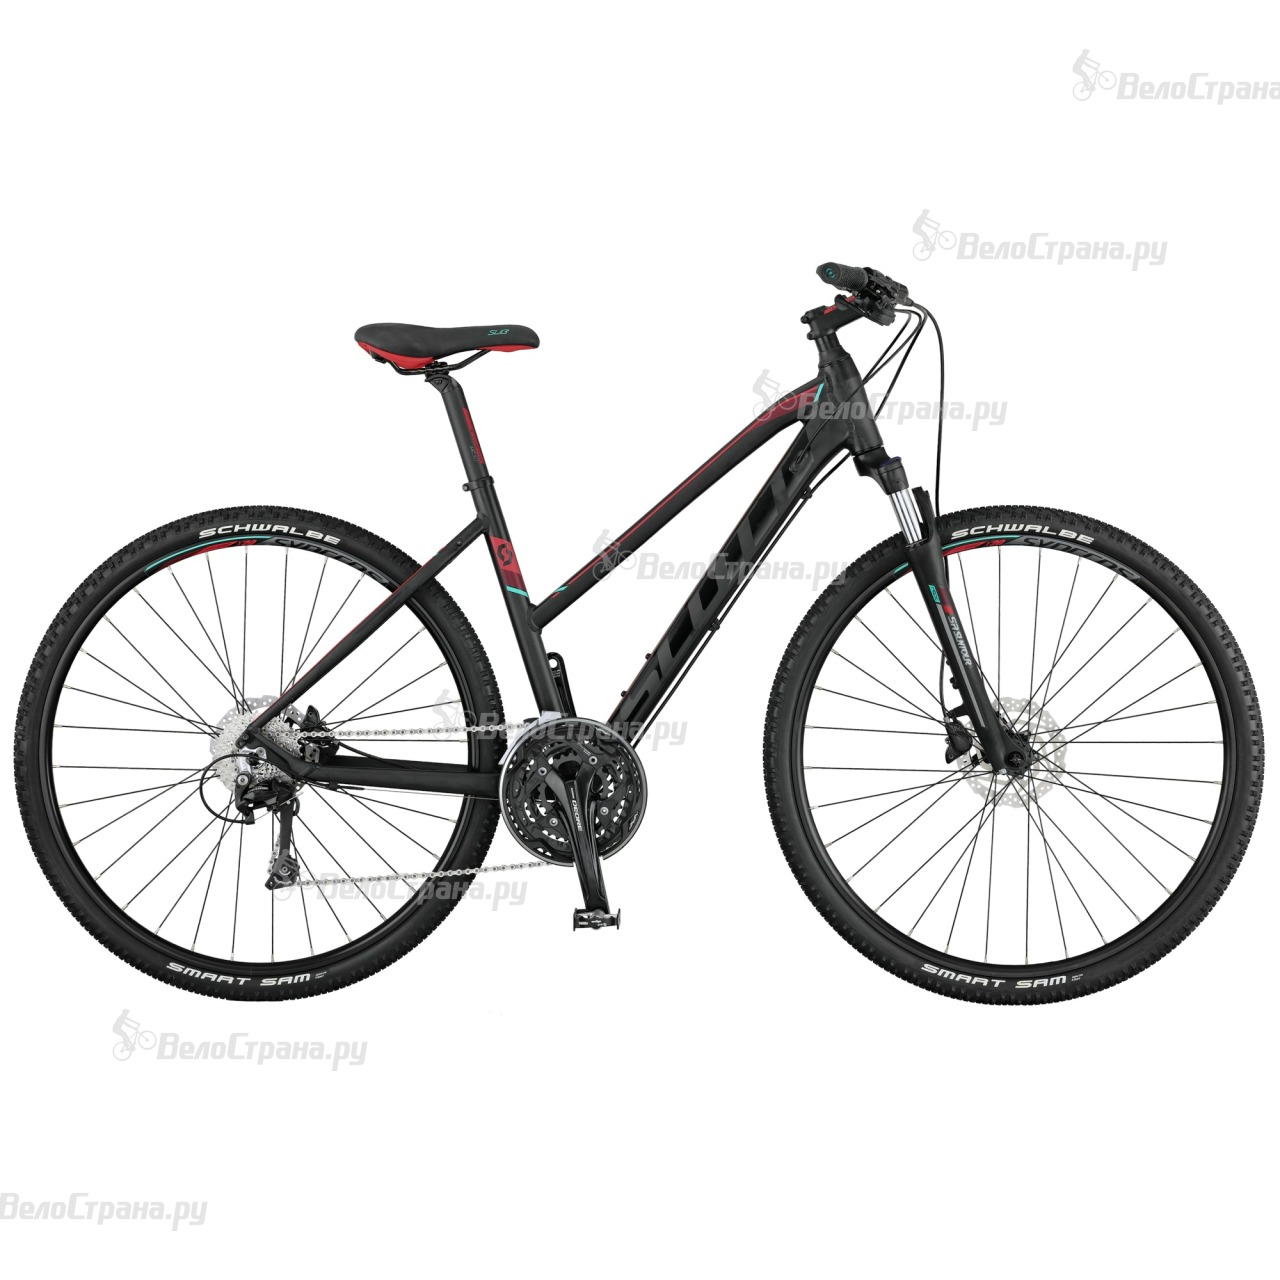 Велосипед Scott Sub Cross 20 Lady (2017) велосипед scott sub cross 30 men 2017